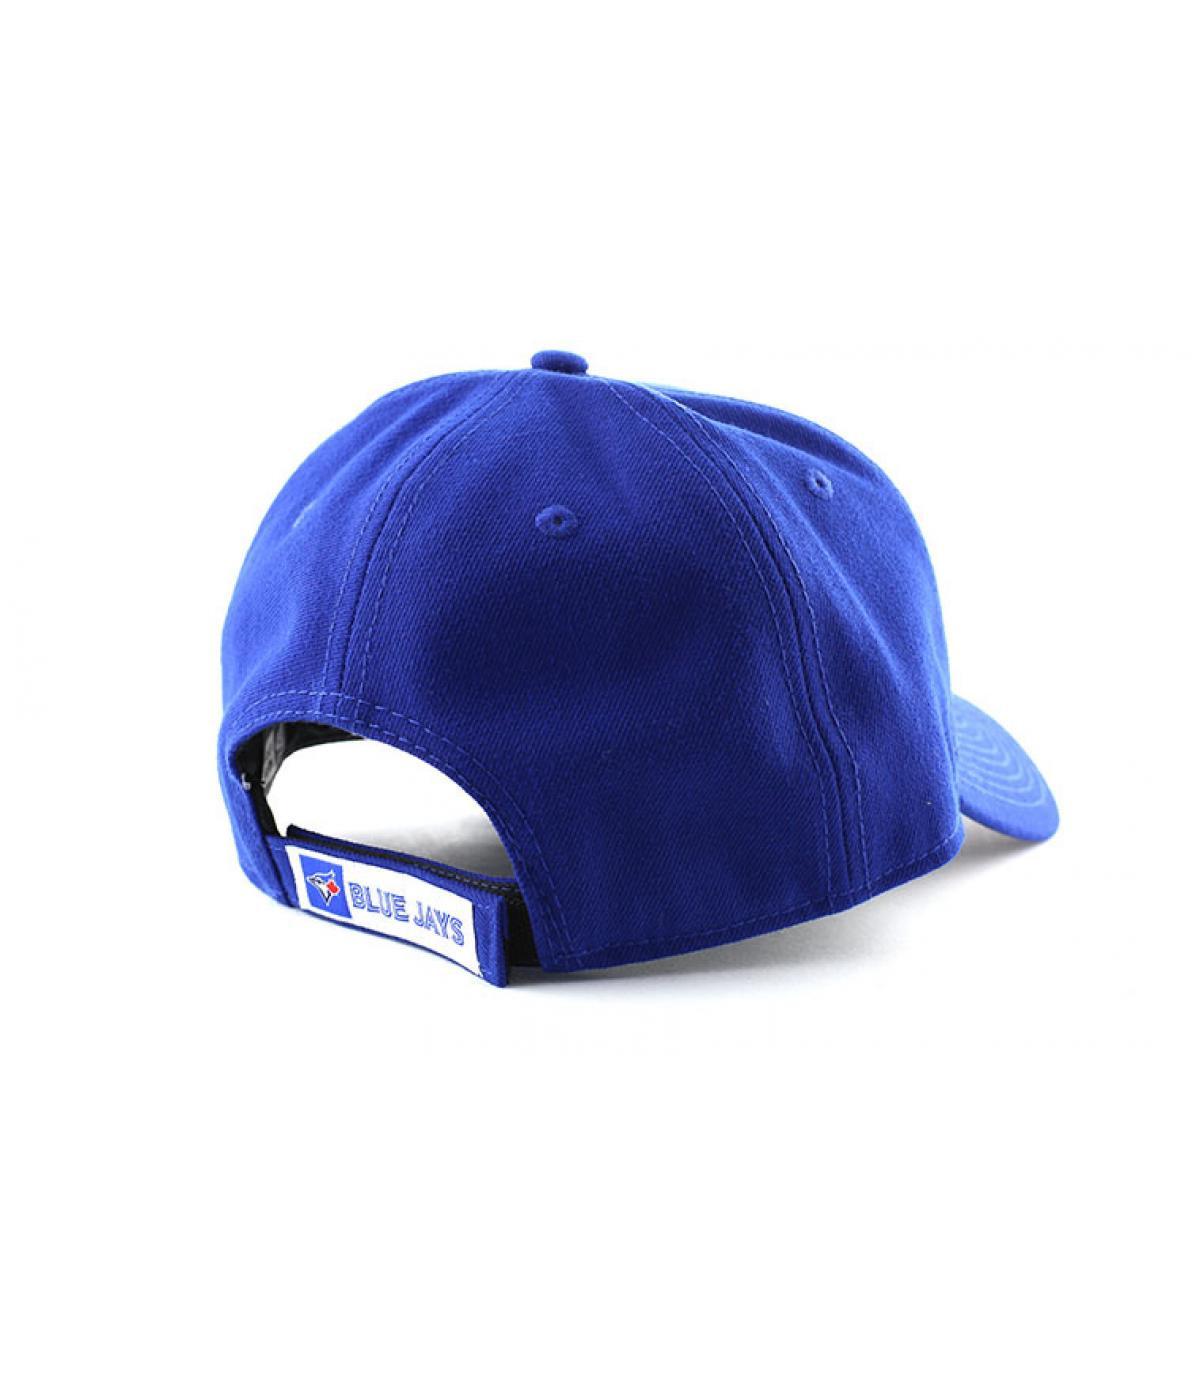 bffd44bcd5705 New Era. Toronto baseball cap. Détails League 9forty Toronto - image ...